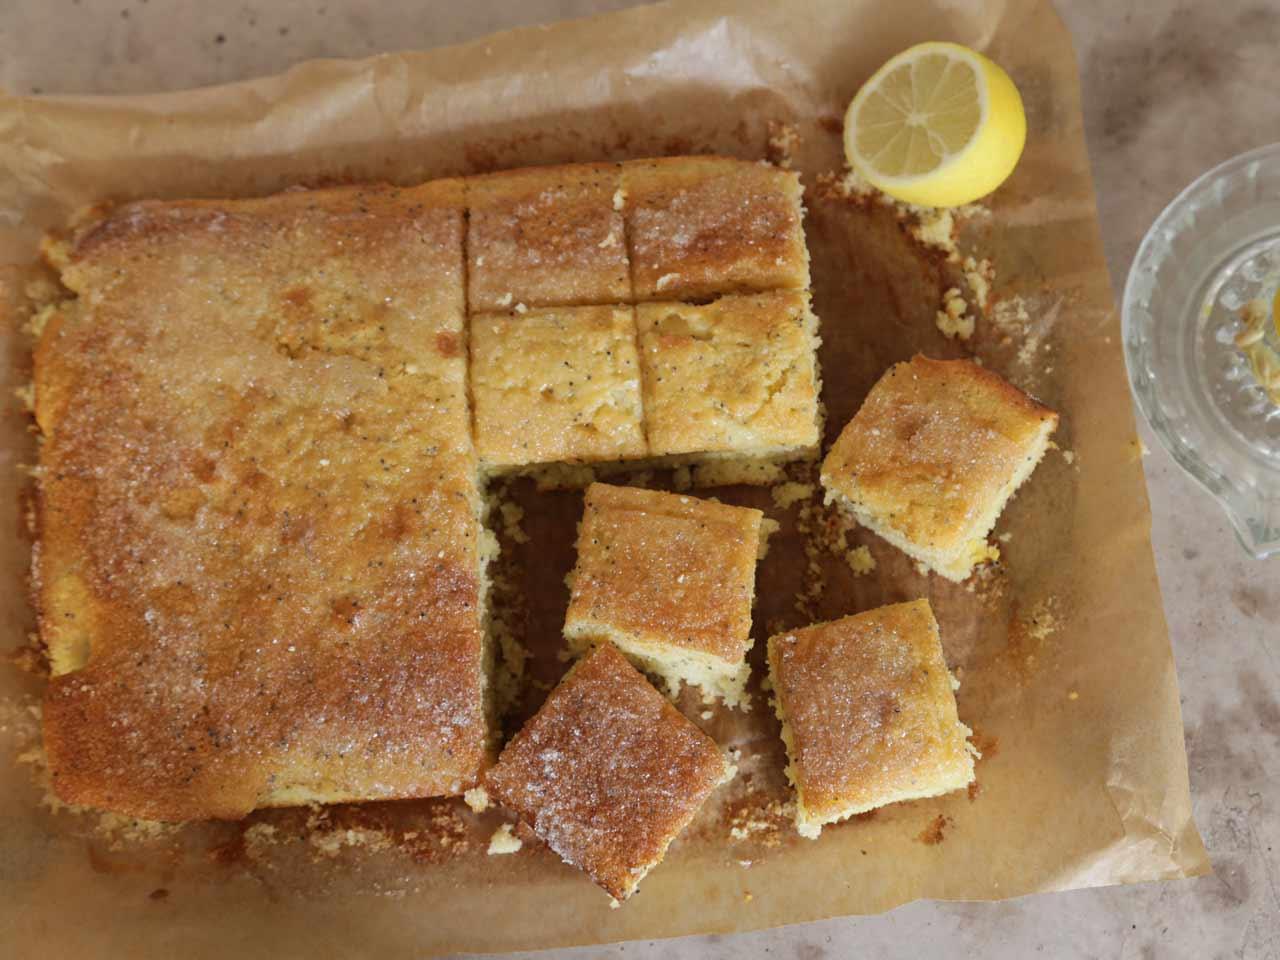 Lemon Drizzle Traybake Saga